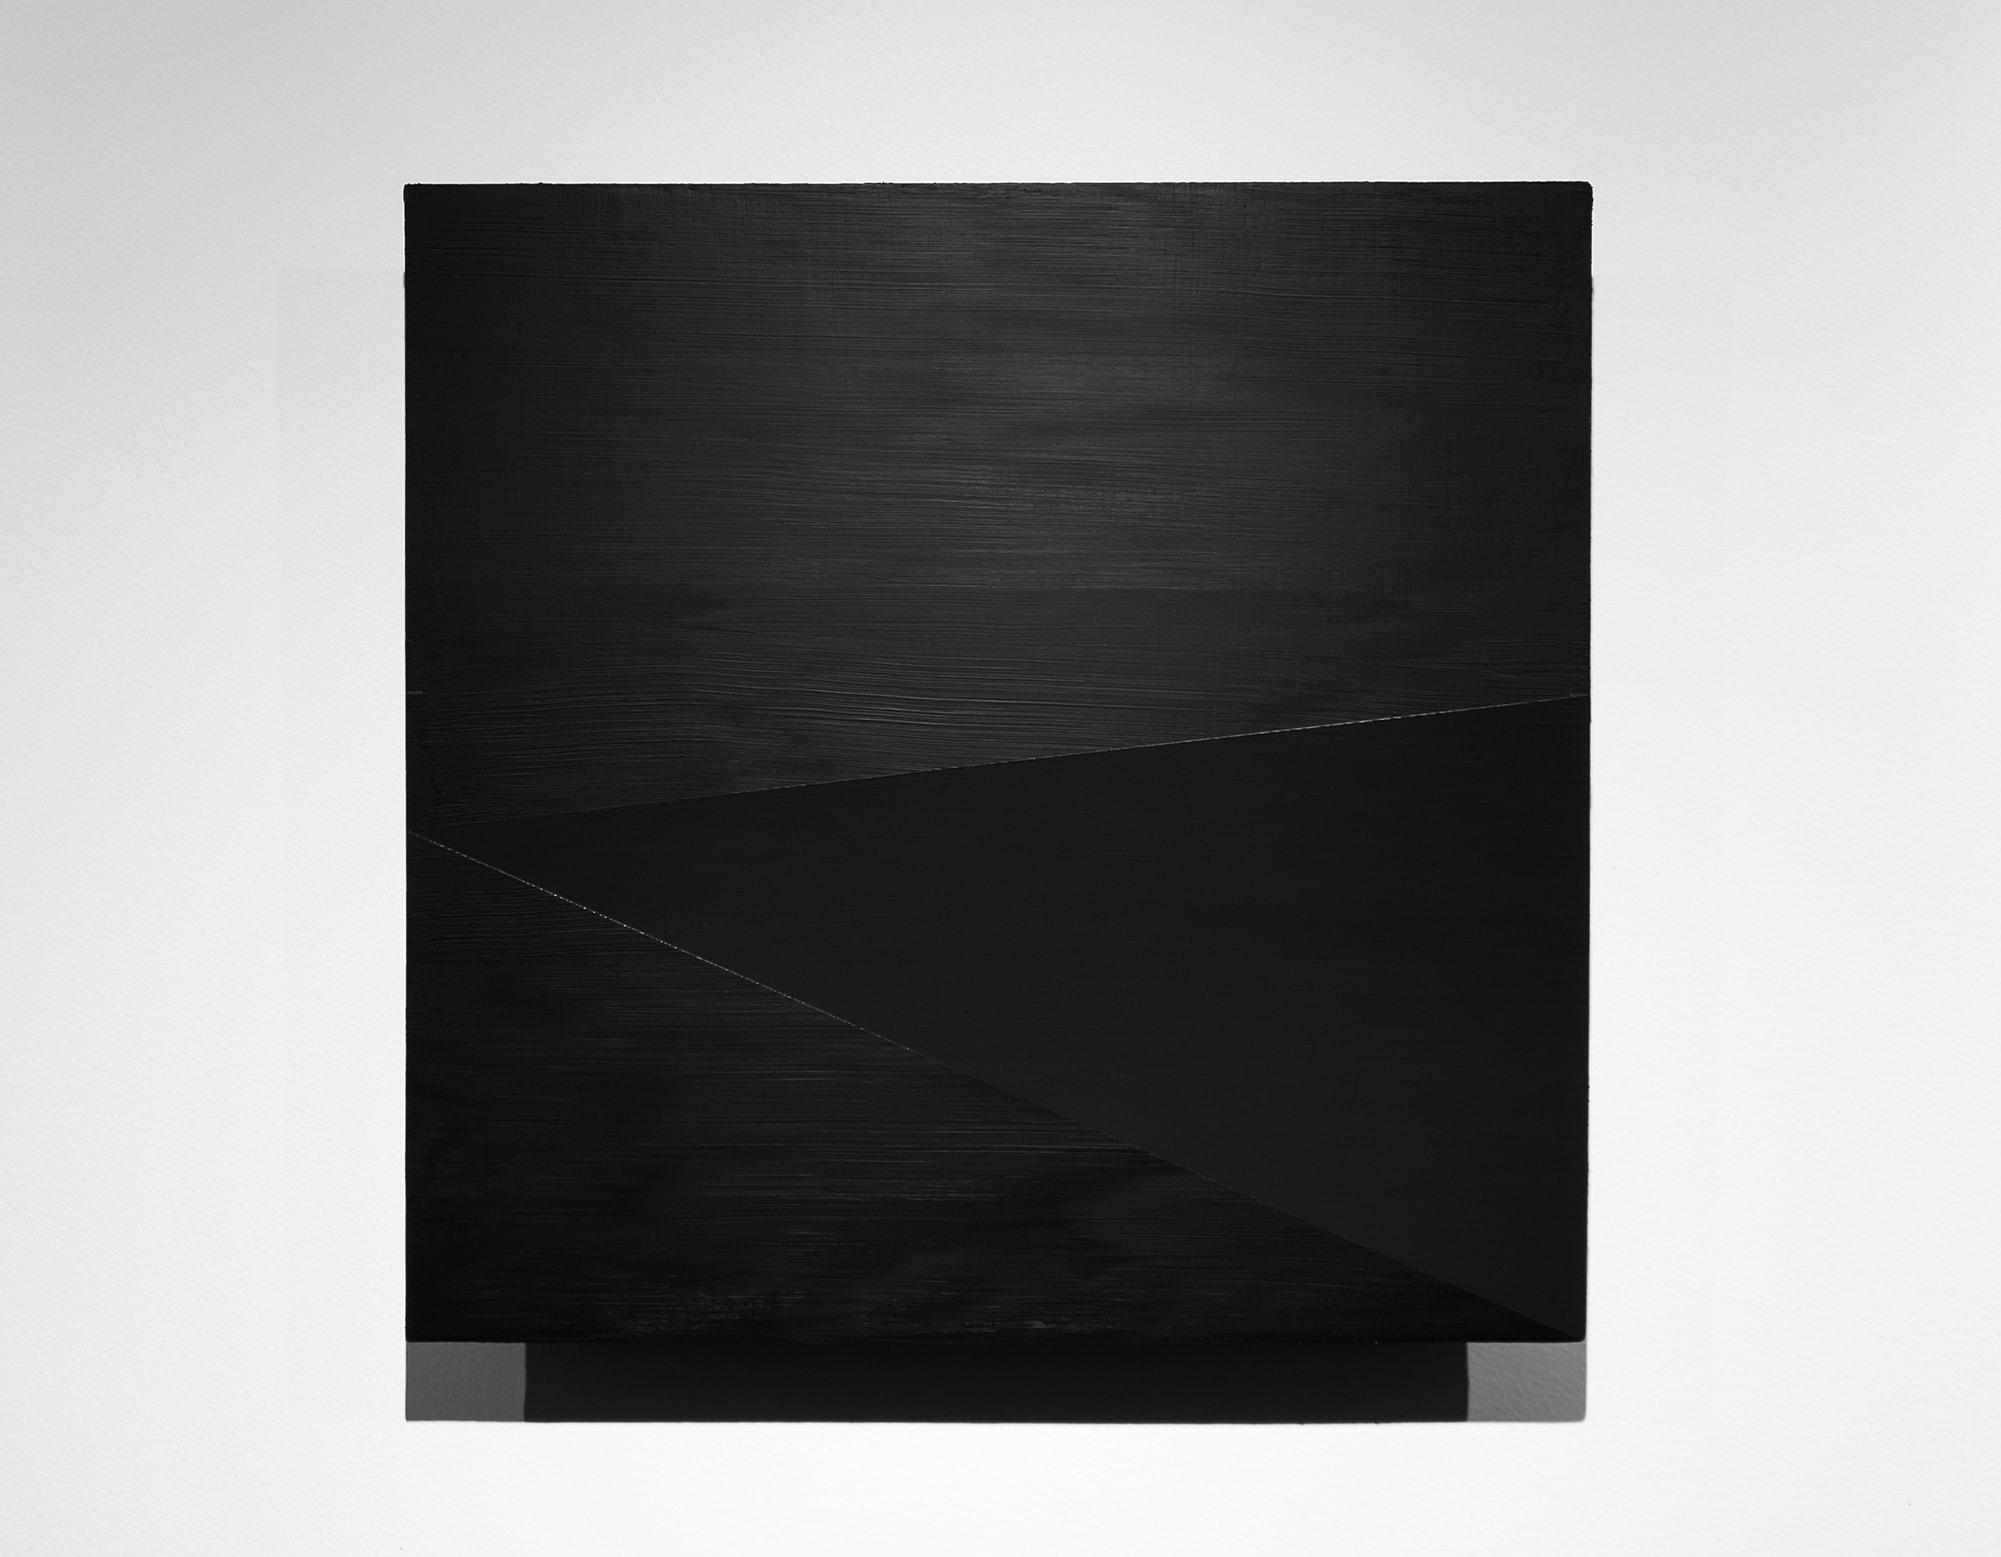 Randy Gibson : Rational Wedge 81:64 (Black)